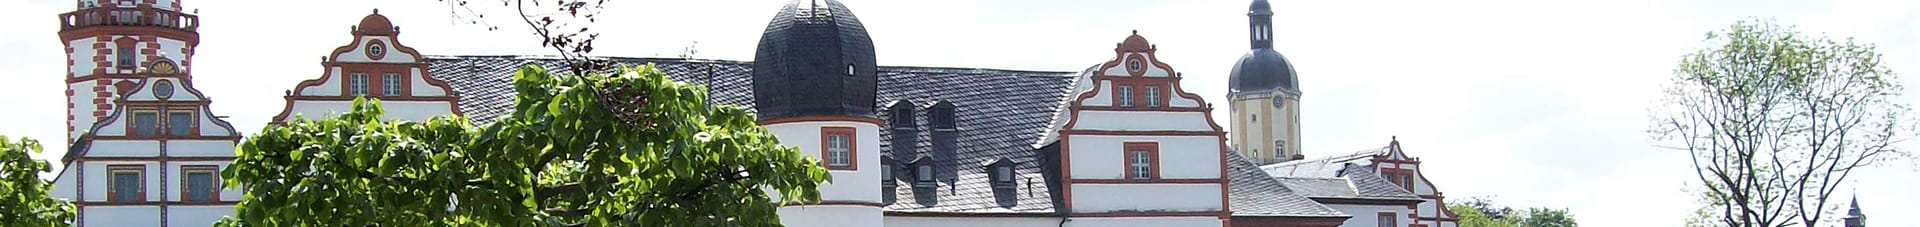 Schütz Zahntechnik Bethmann in Ohrdruf.